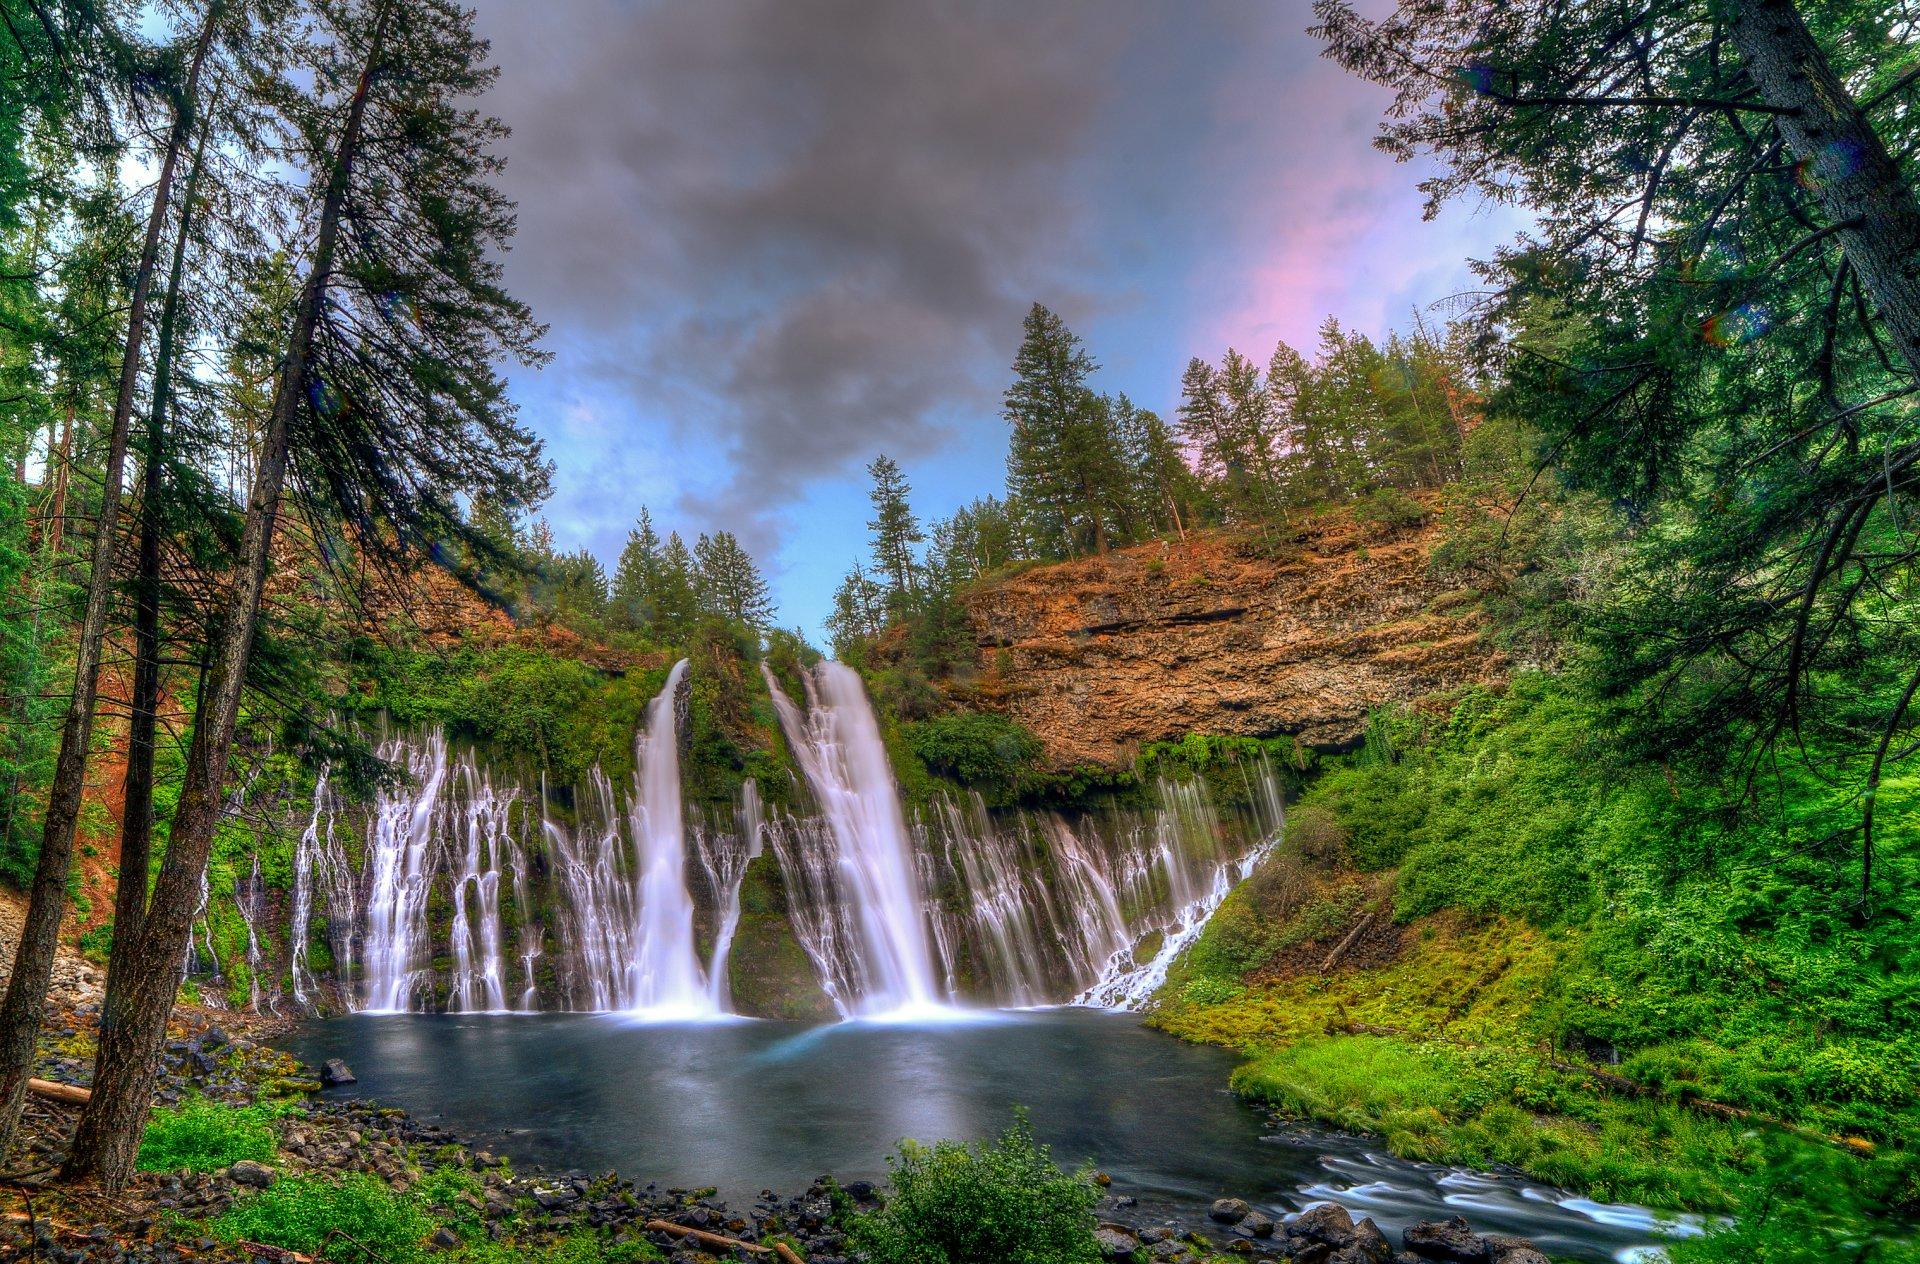 Burney falls in california hd wallpaper background image - Waterfalls desktop wallpaper forest falls ...